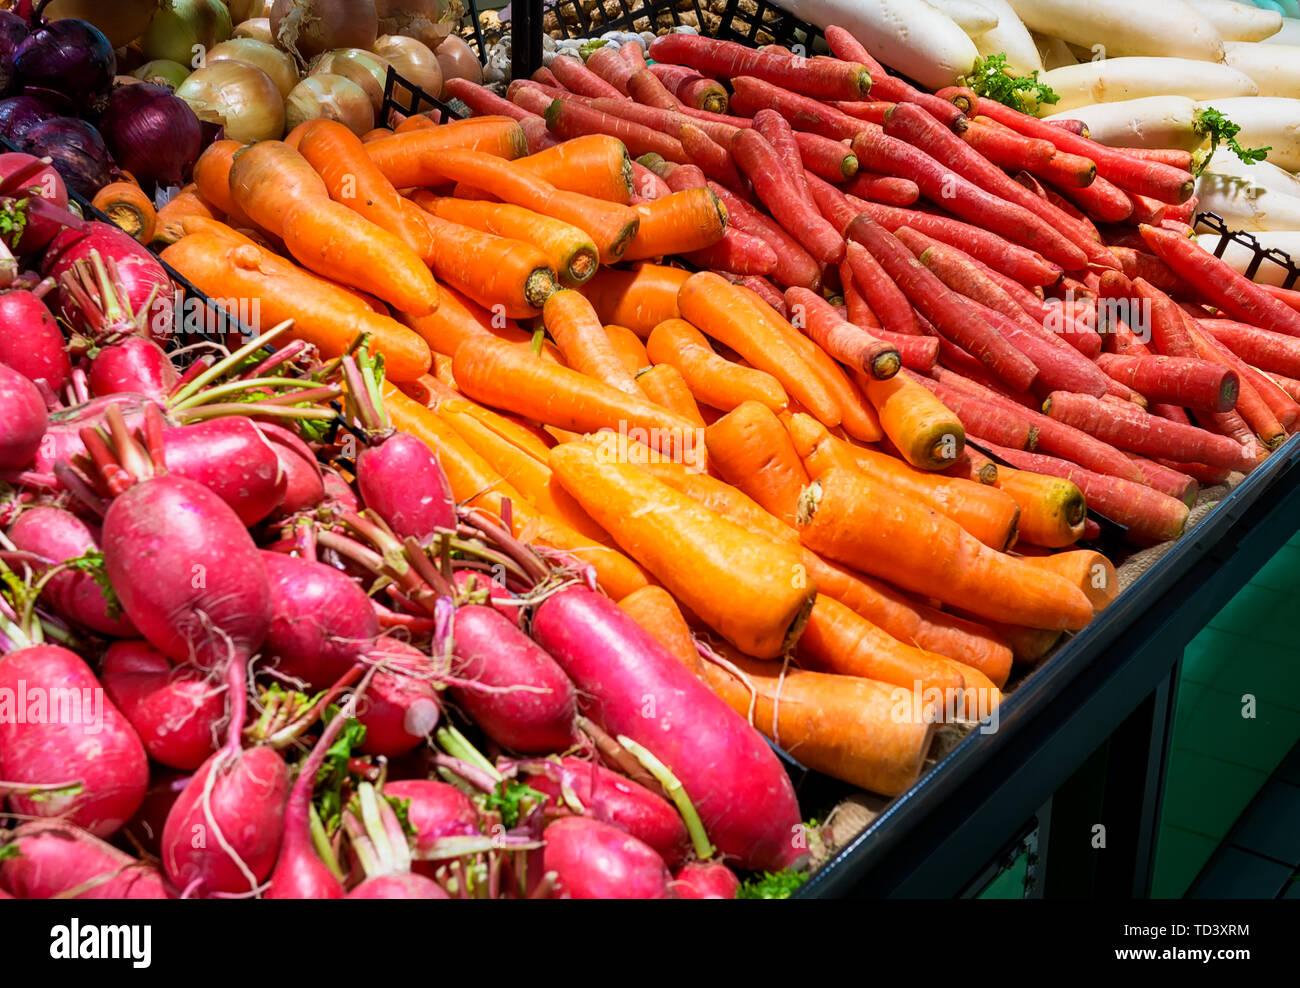 All kinds of radishes on supermarket shelves Stock Photo